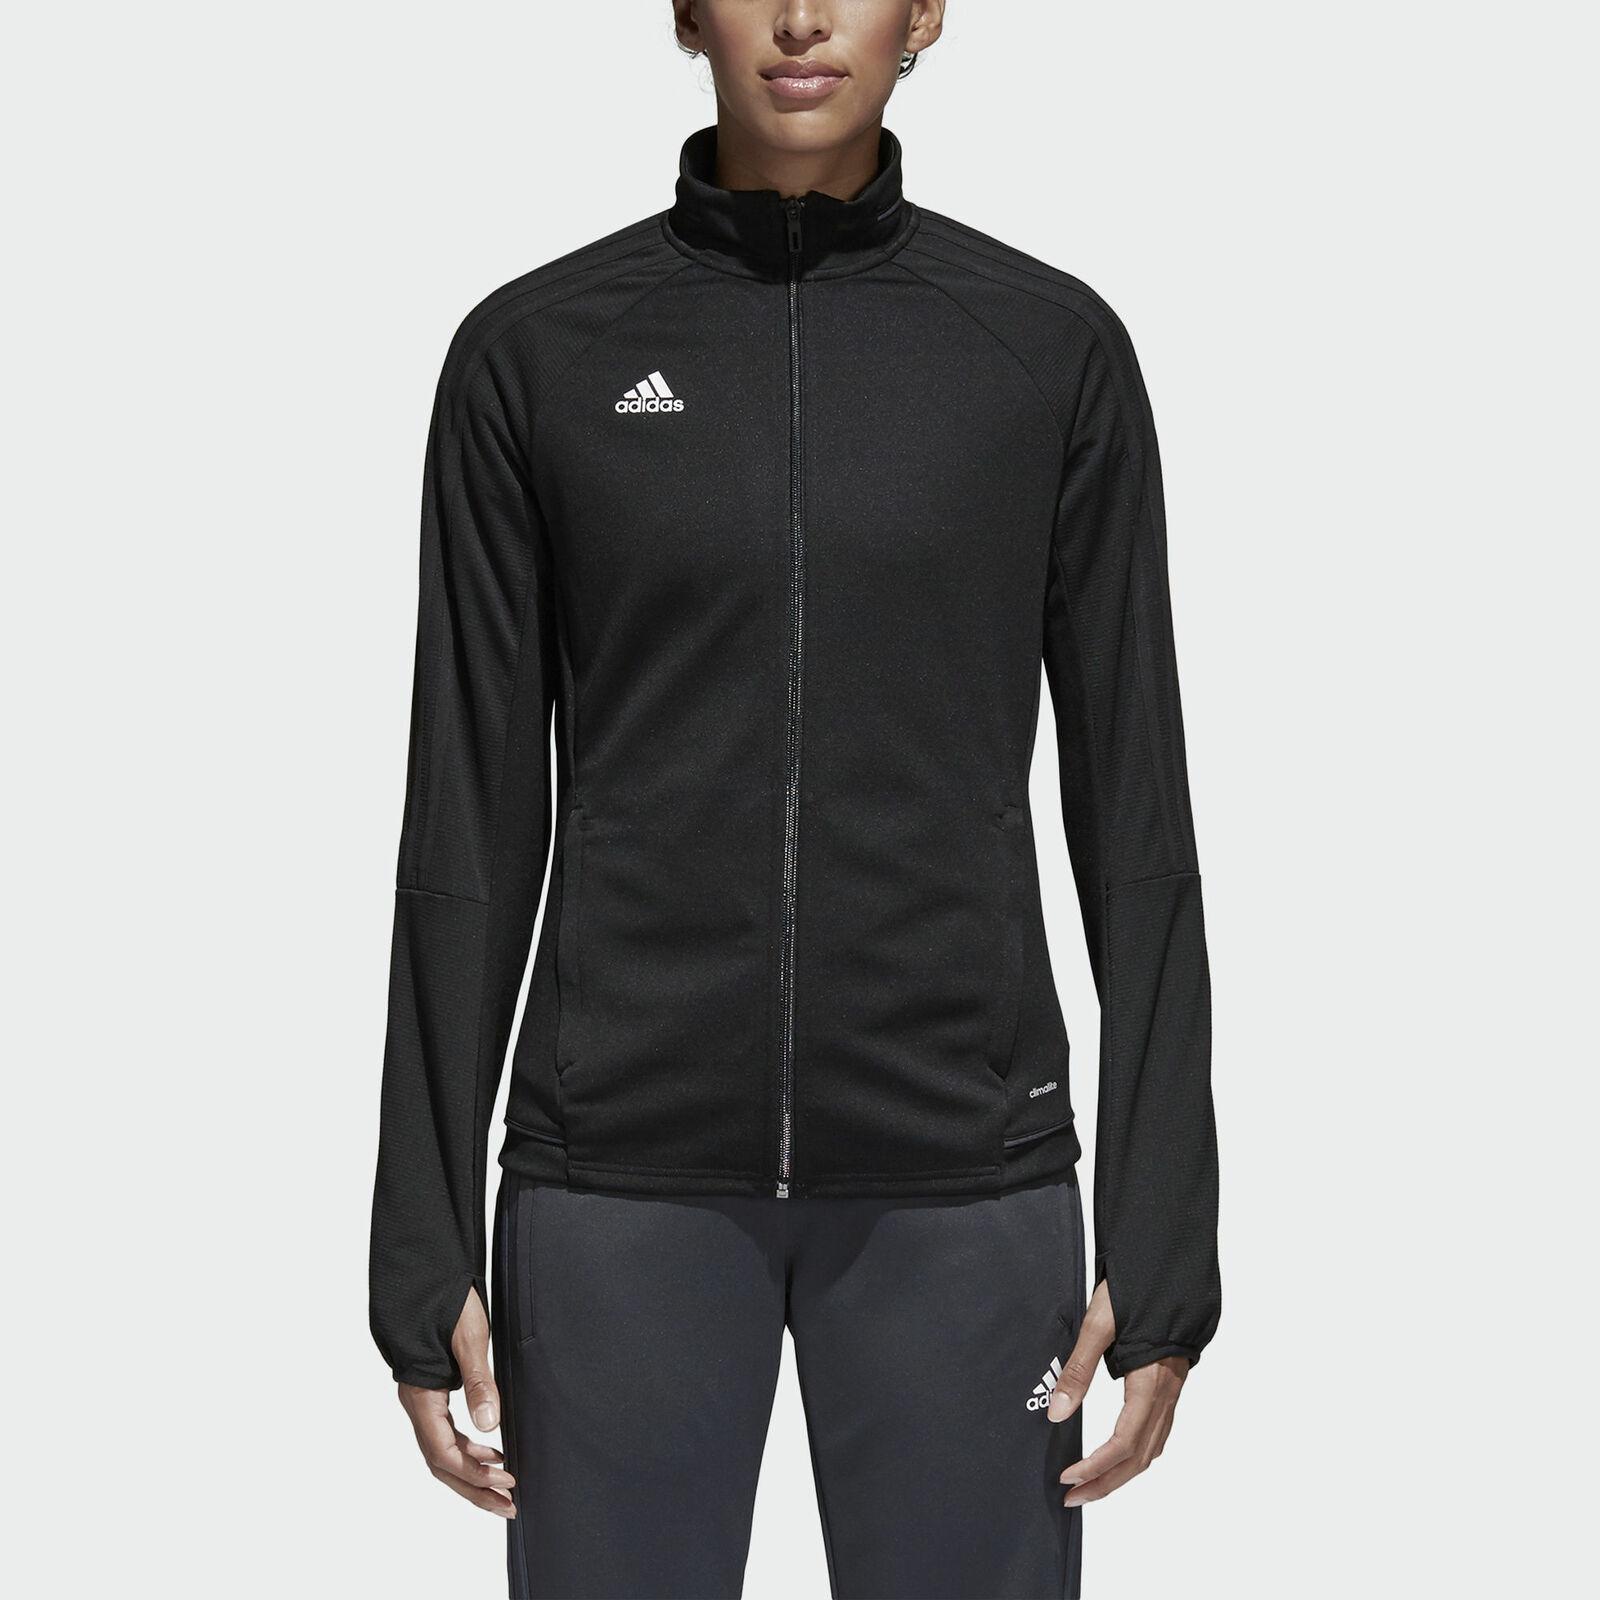 adidas Women's Tiro 17 Training Jacket or Pants